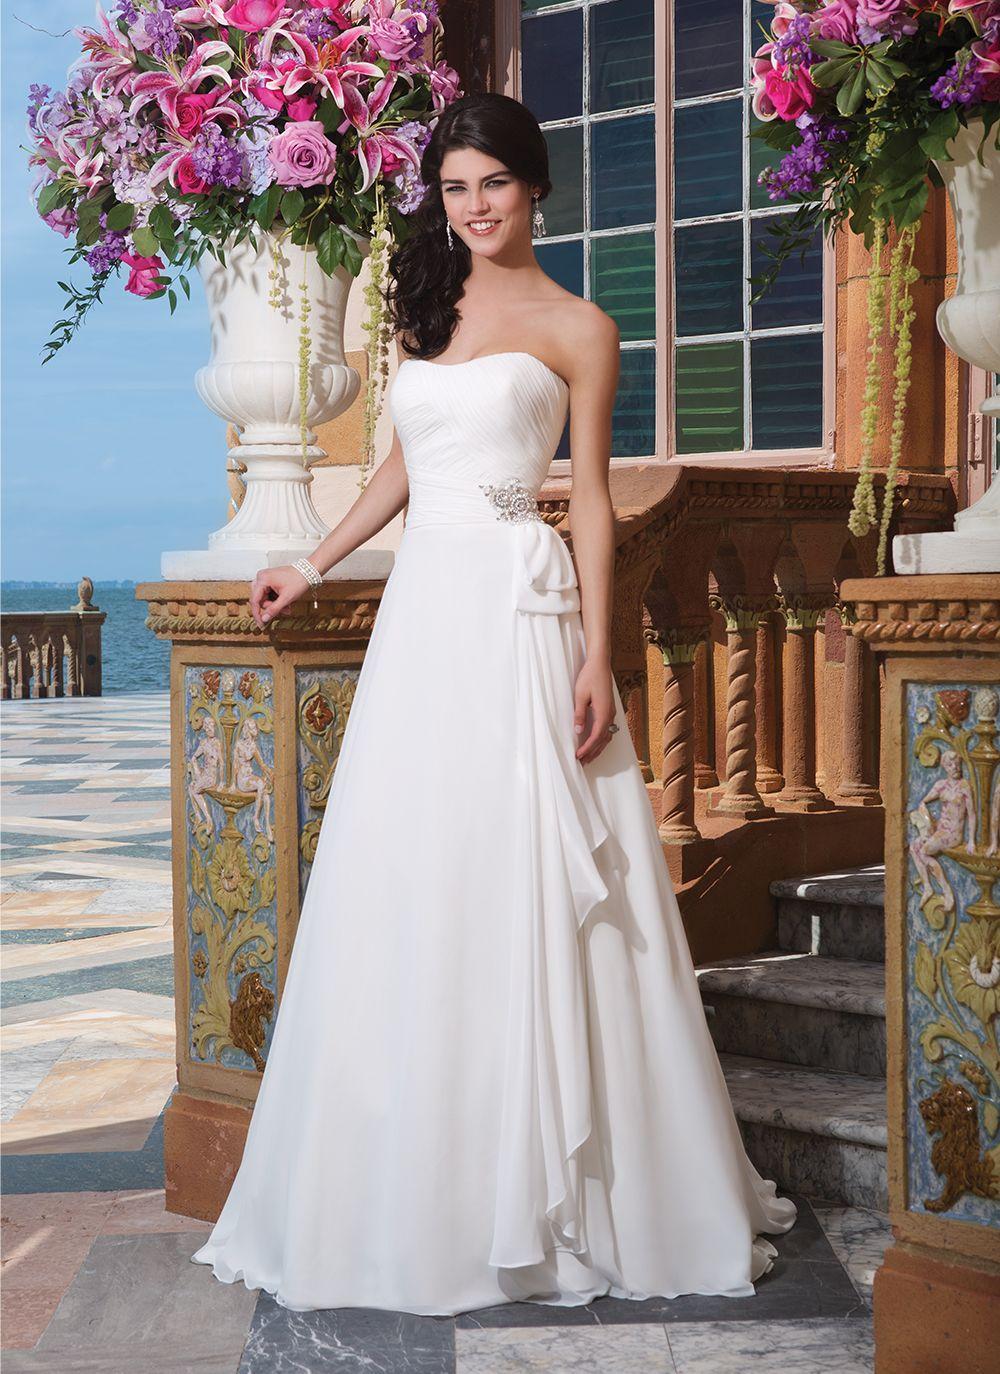 Sincerity wedding dress style chiffon aline dress adorned